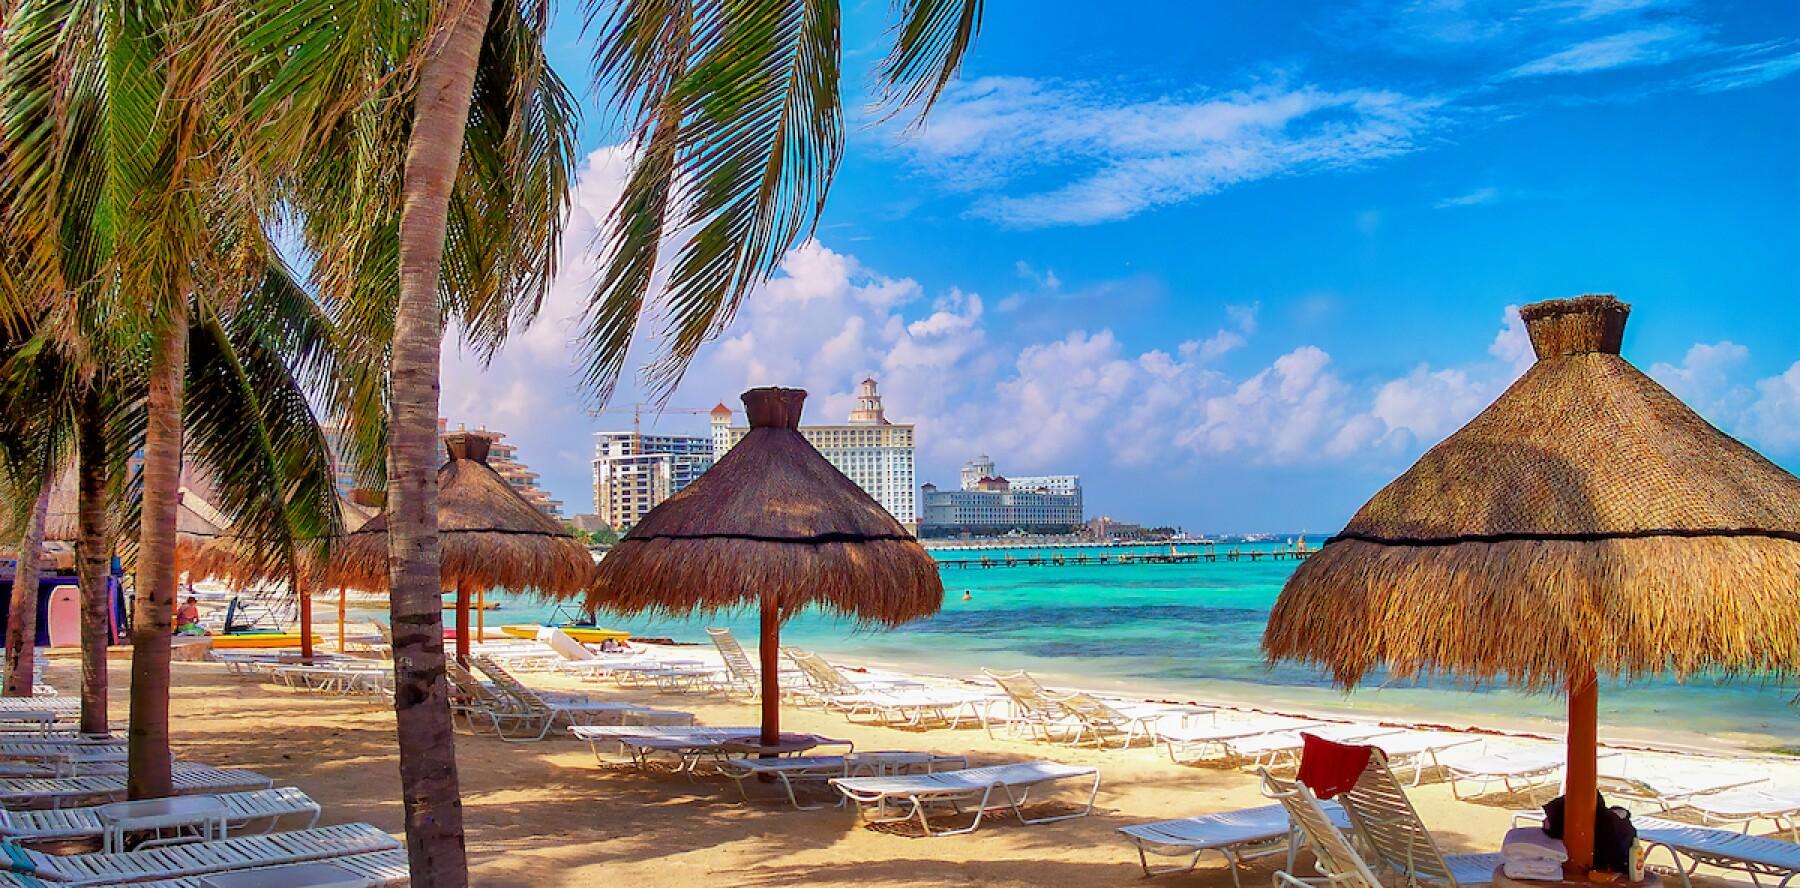 Panoramic beach scene in Cancun, Mexico.